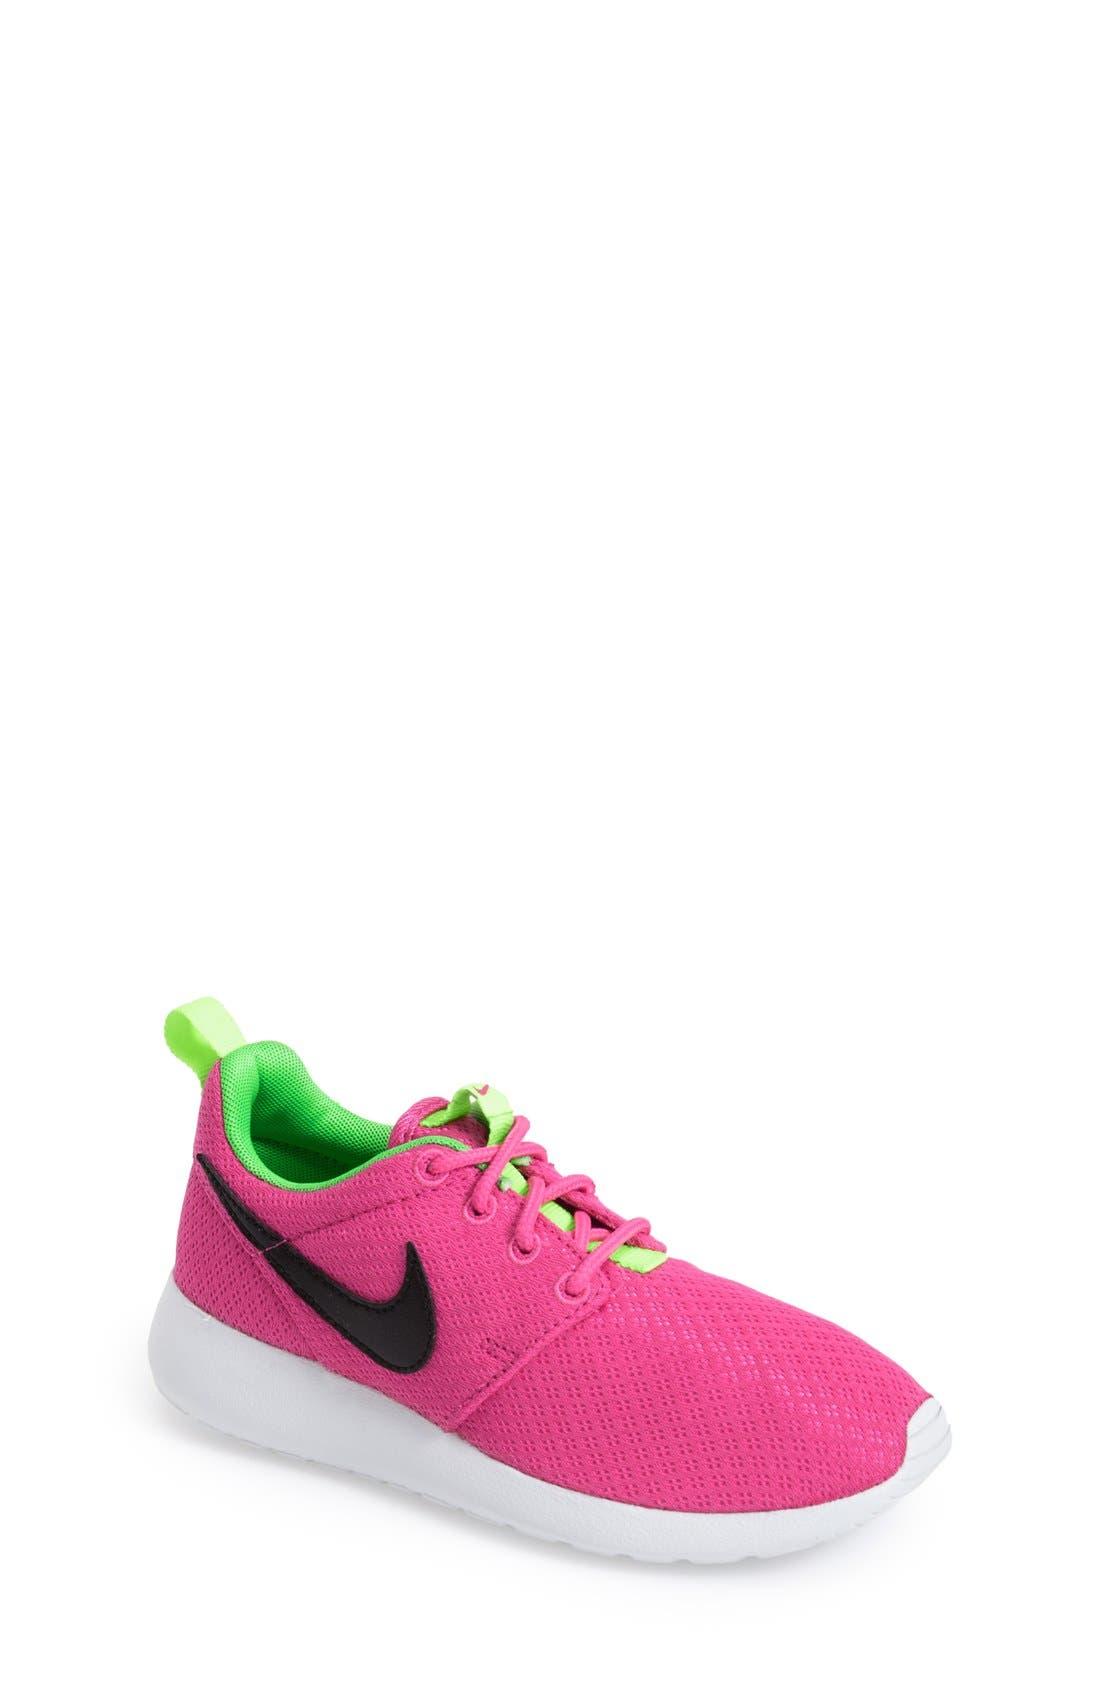 'Roshe Run' Athletic Shoe,                             Main thumbnail 46, color,